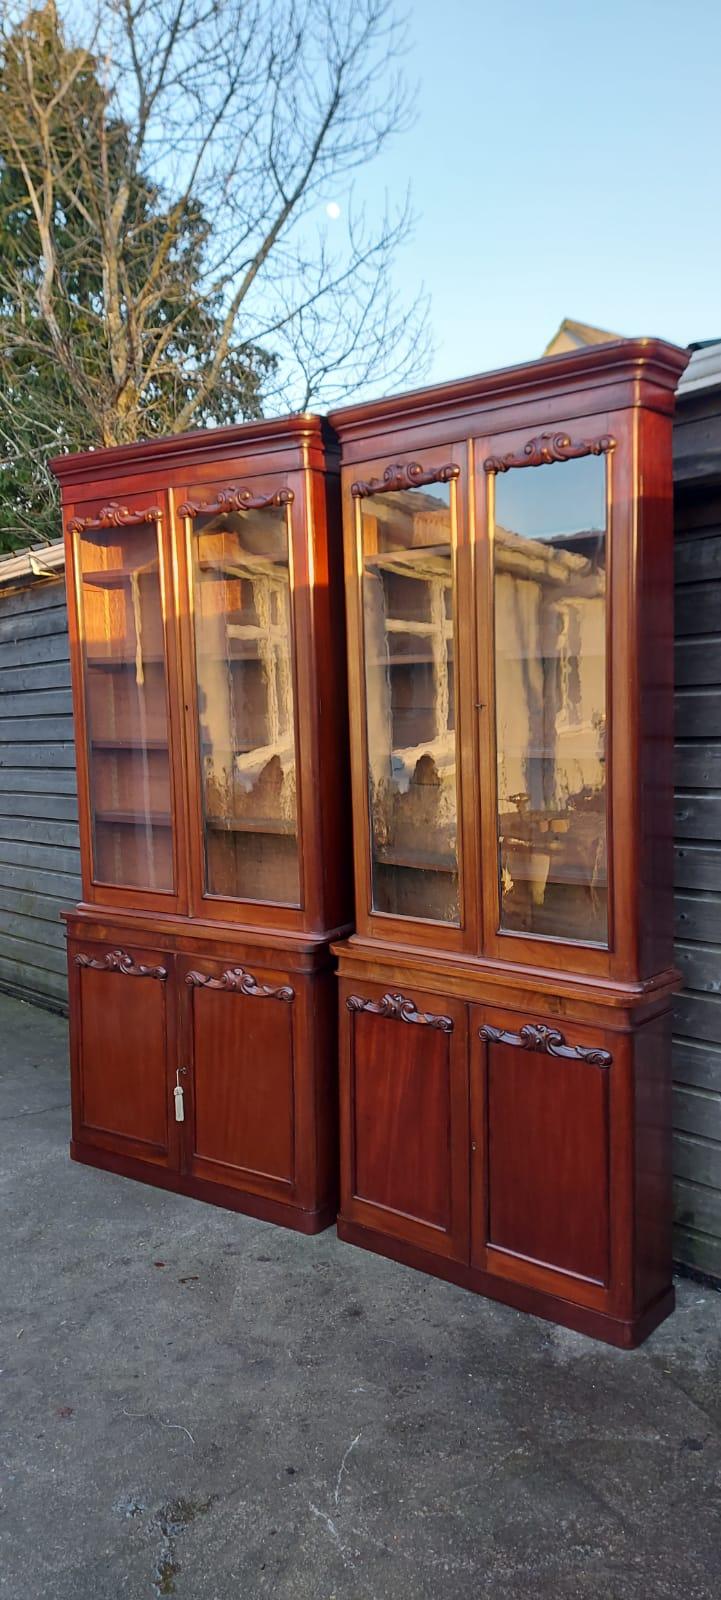 Very Rare Pair of Narrow and Slimline 19C Mahogany Bookcases (1) 100cmW 29cmD 242cmH (2)